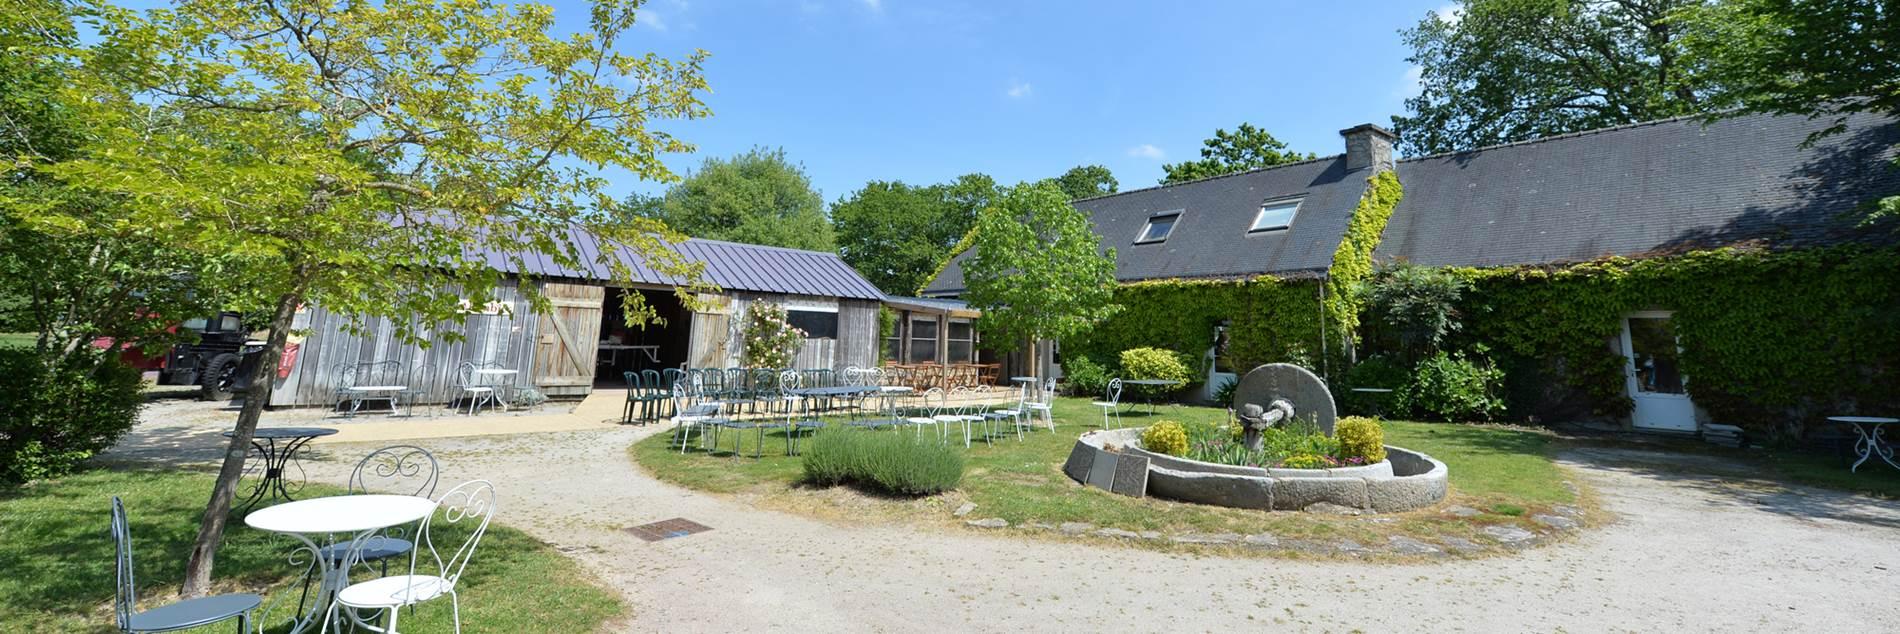 La-Maison-du-Cidre-Le-Hezo-Morbihan-Bretagne-Sud-HD56-3 © M.RENAC-CDT56-2017